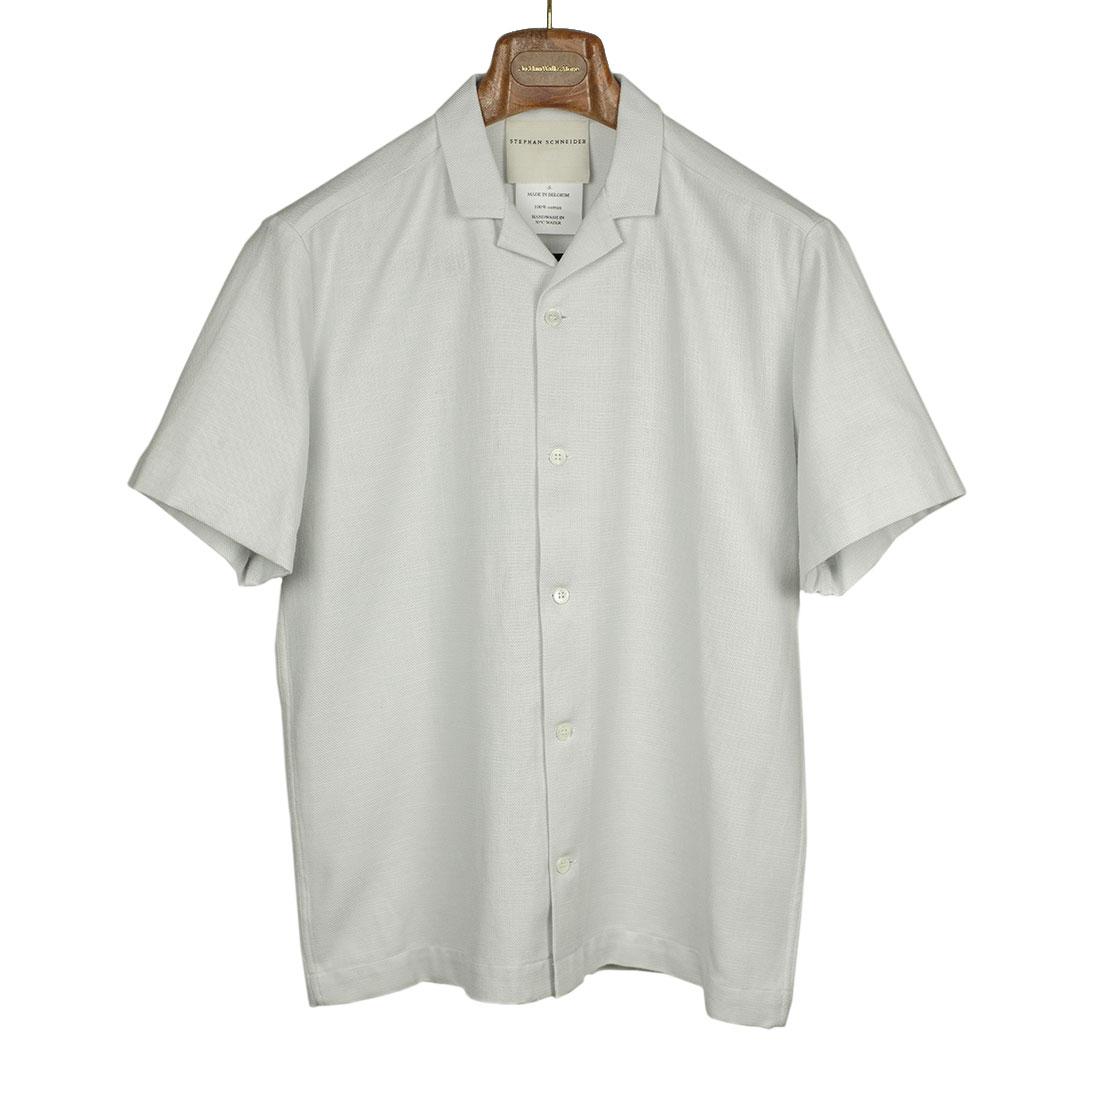 Stephan Schneider Spring Summer 2021 SS21 capri collar camp shirt (5).jpg